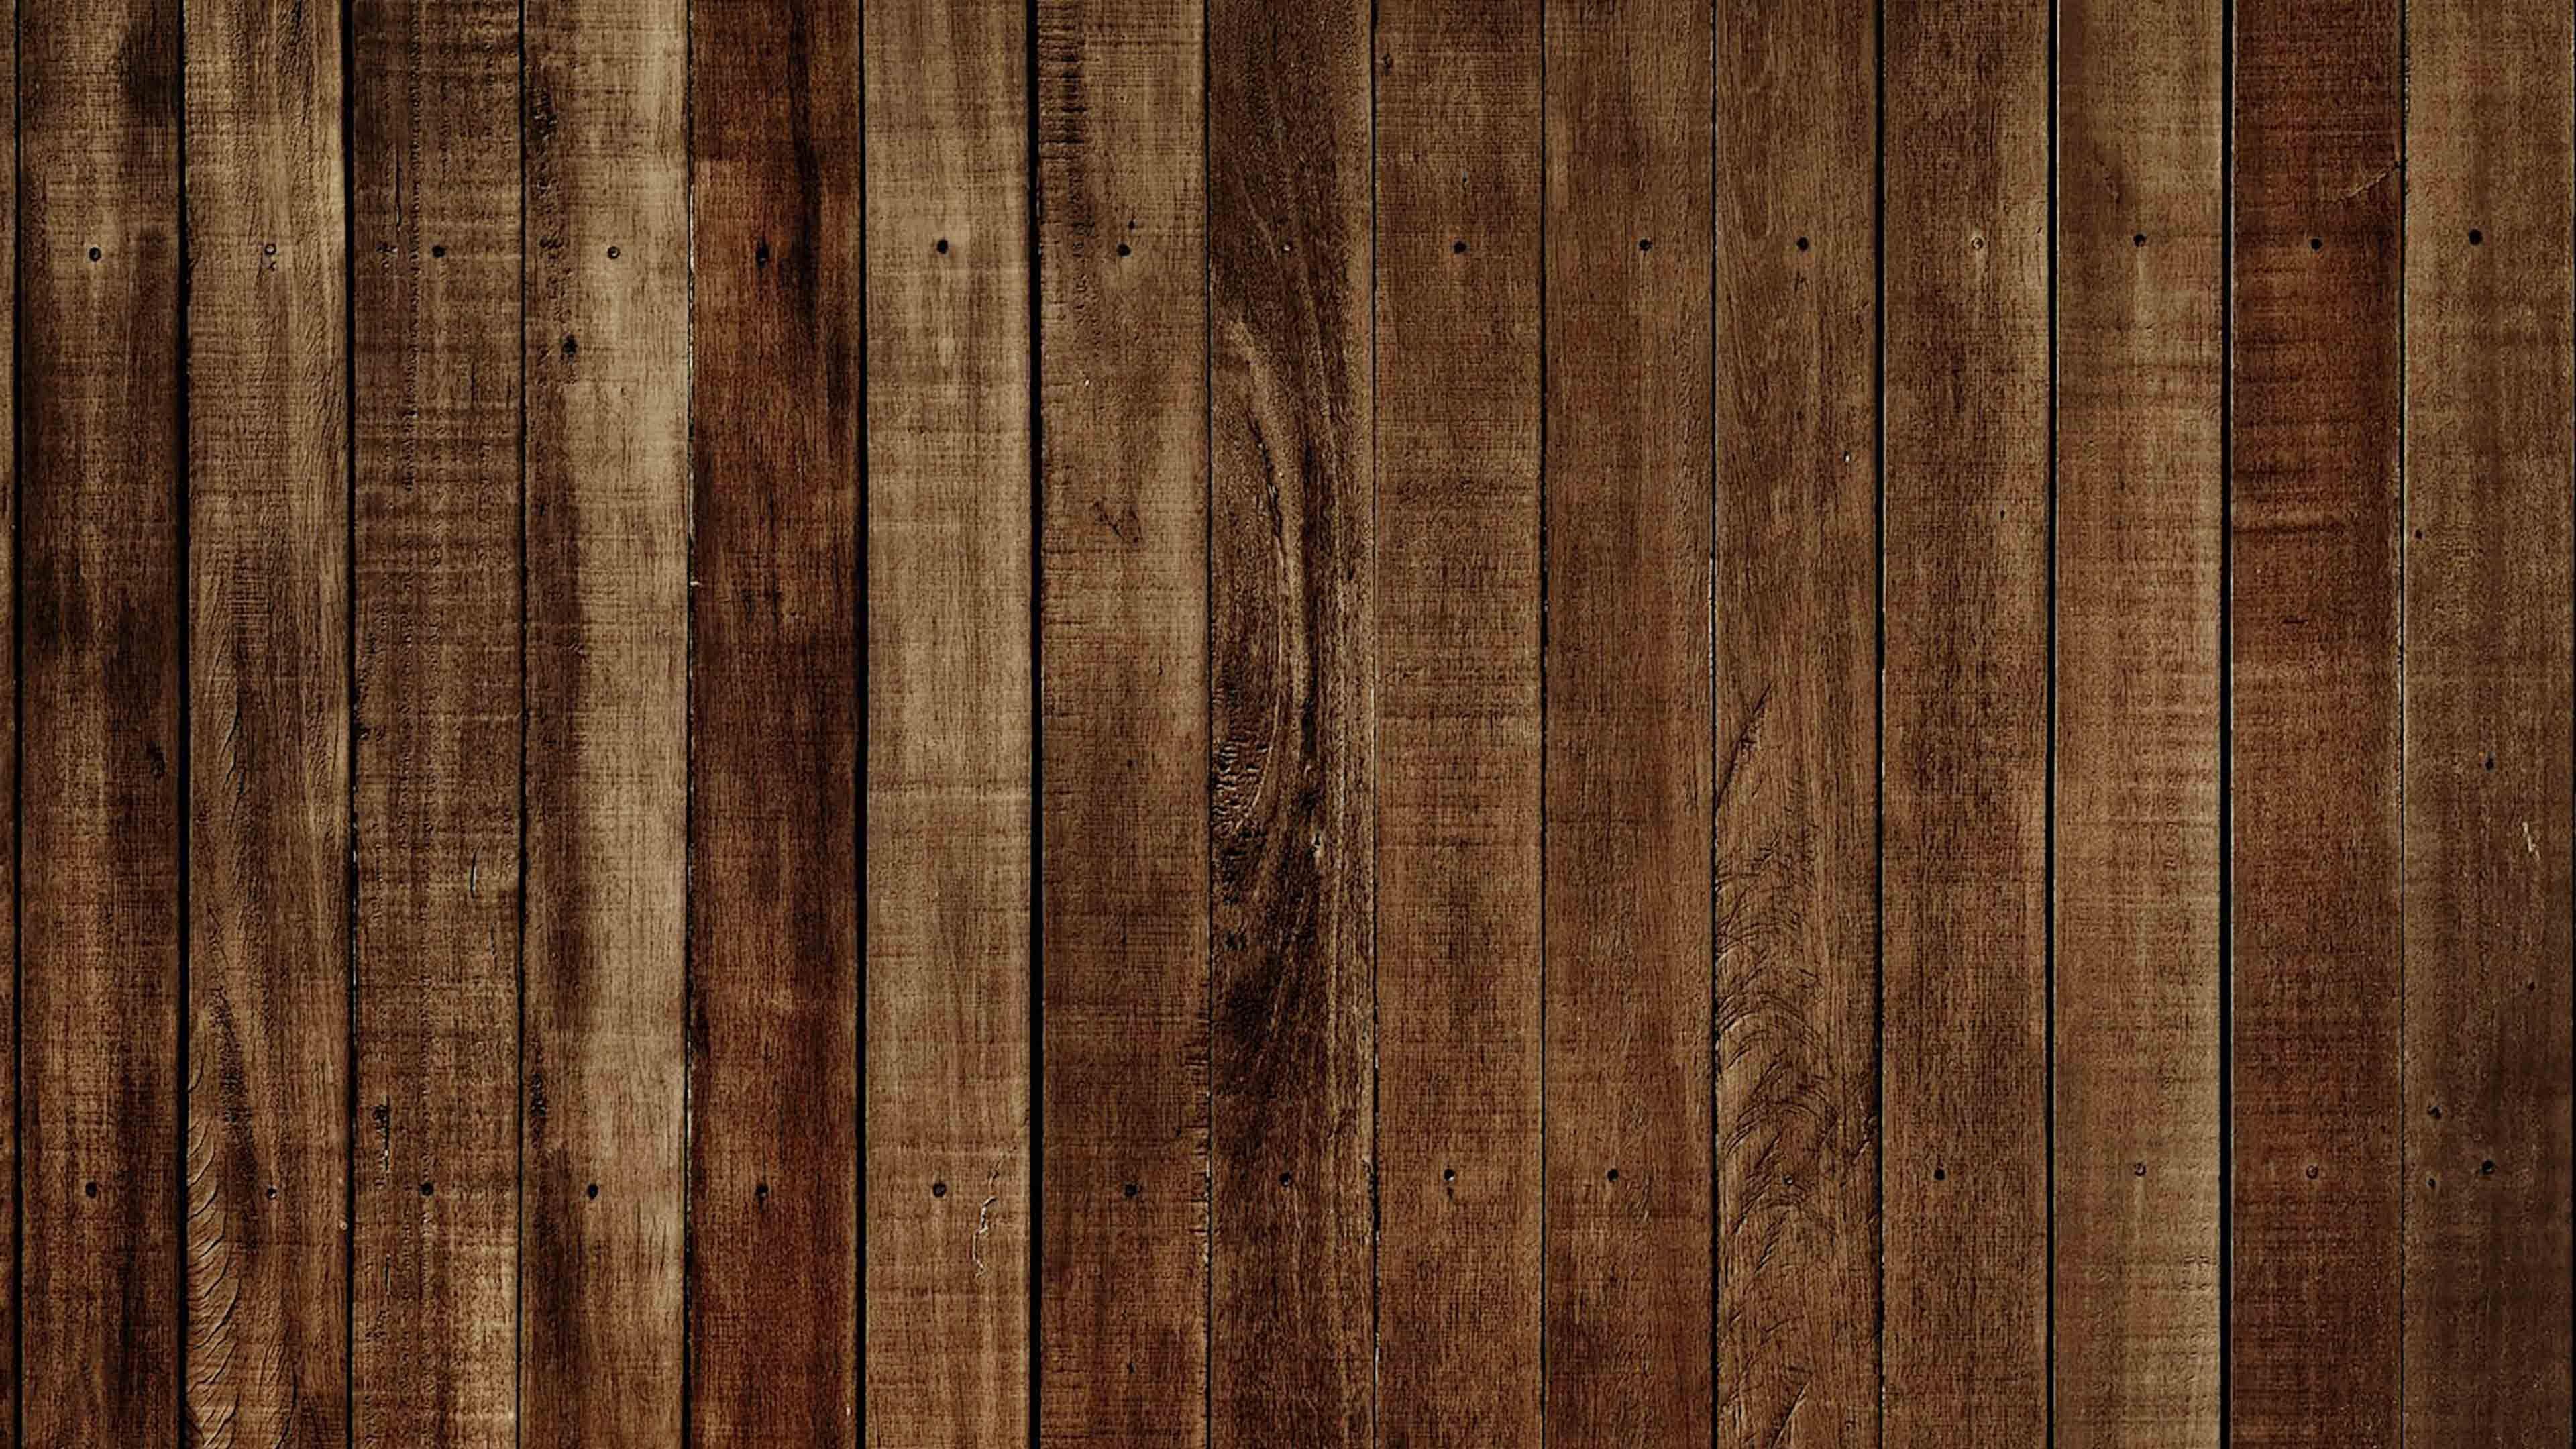 4k Wood Wallpaper